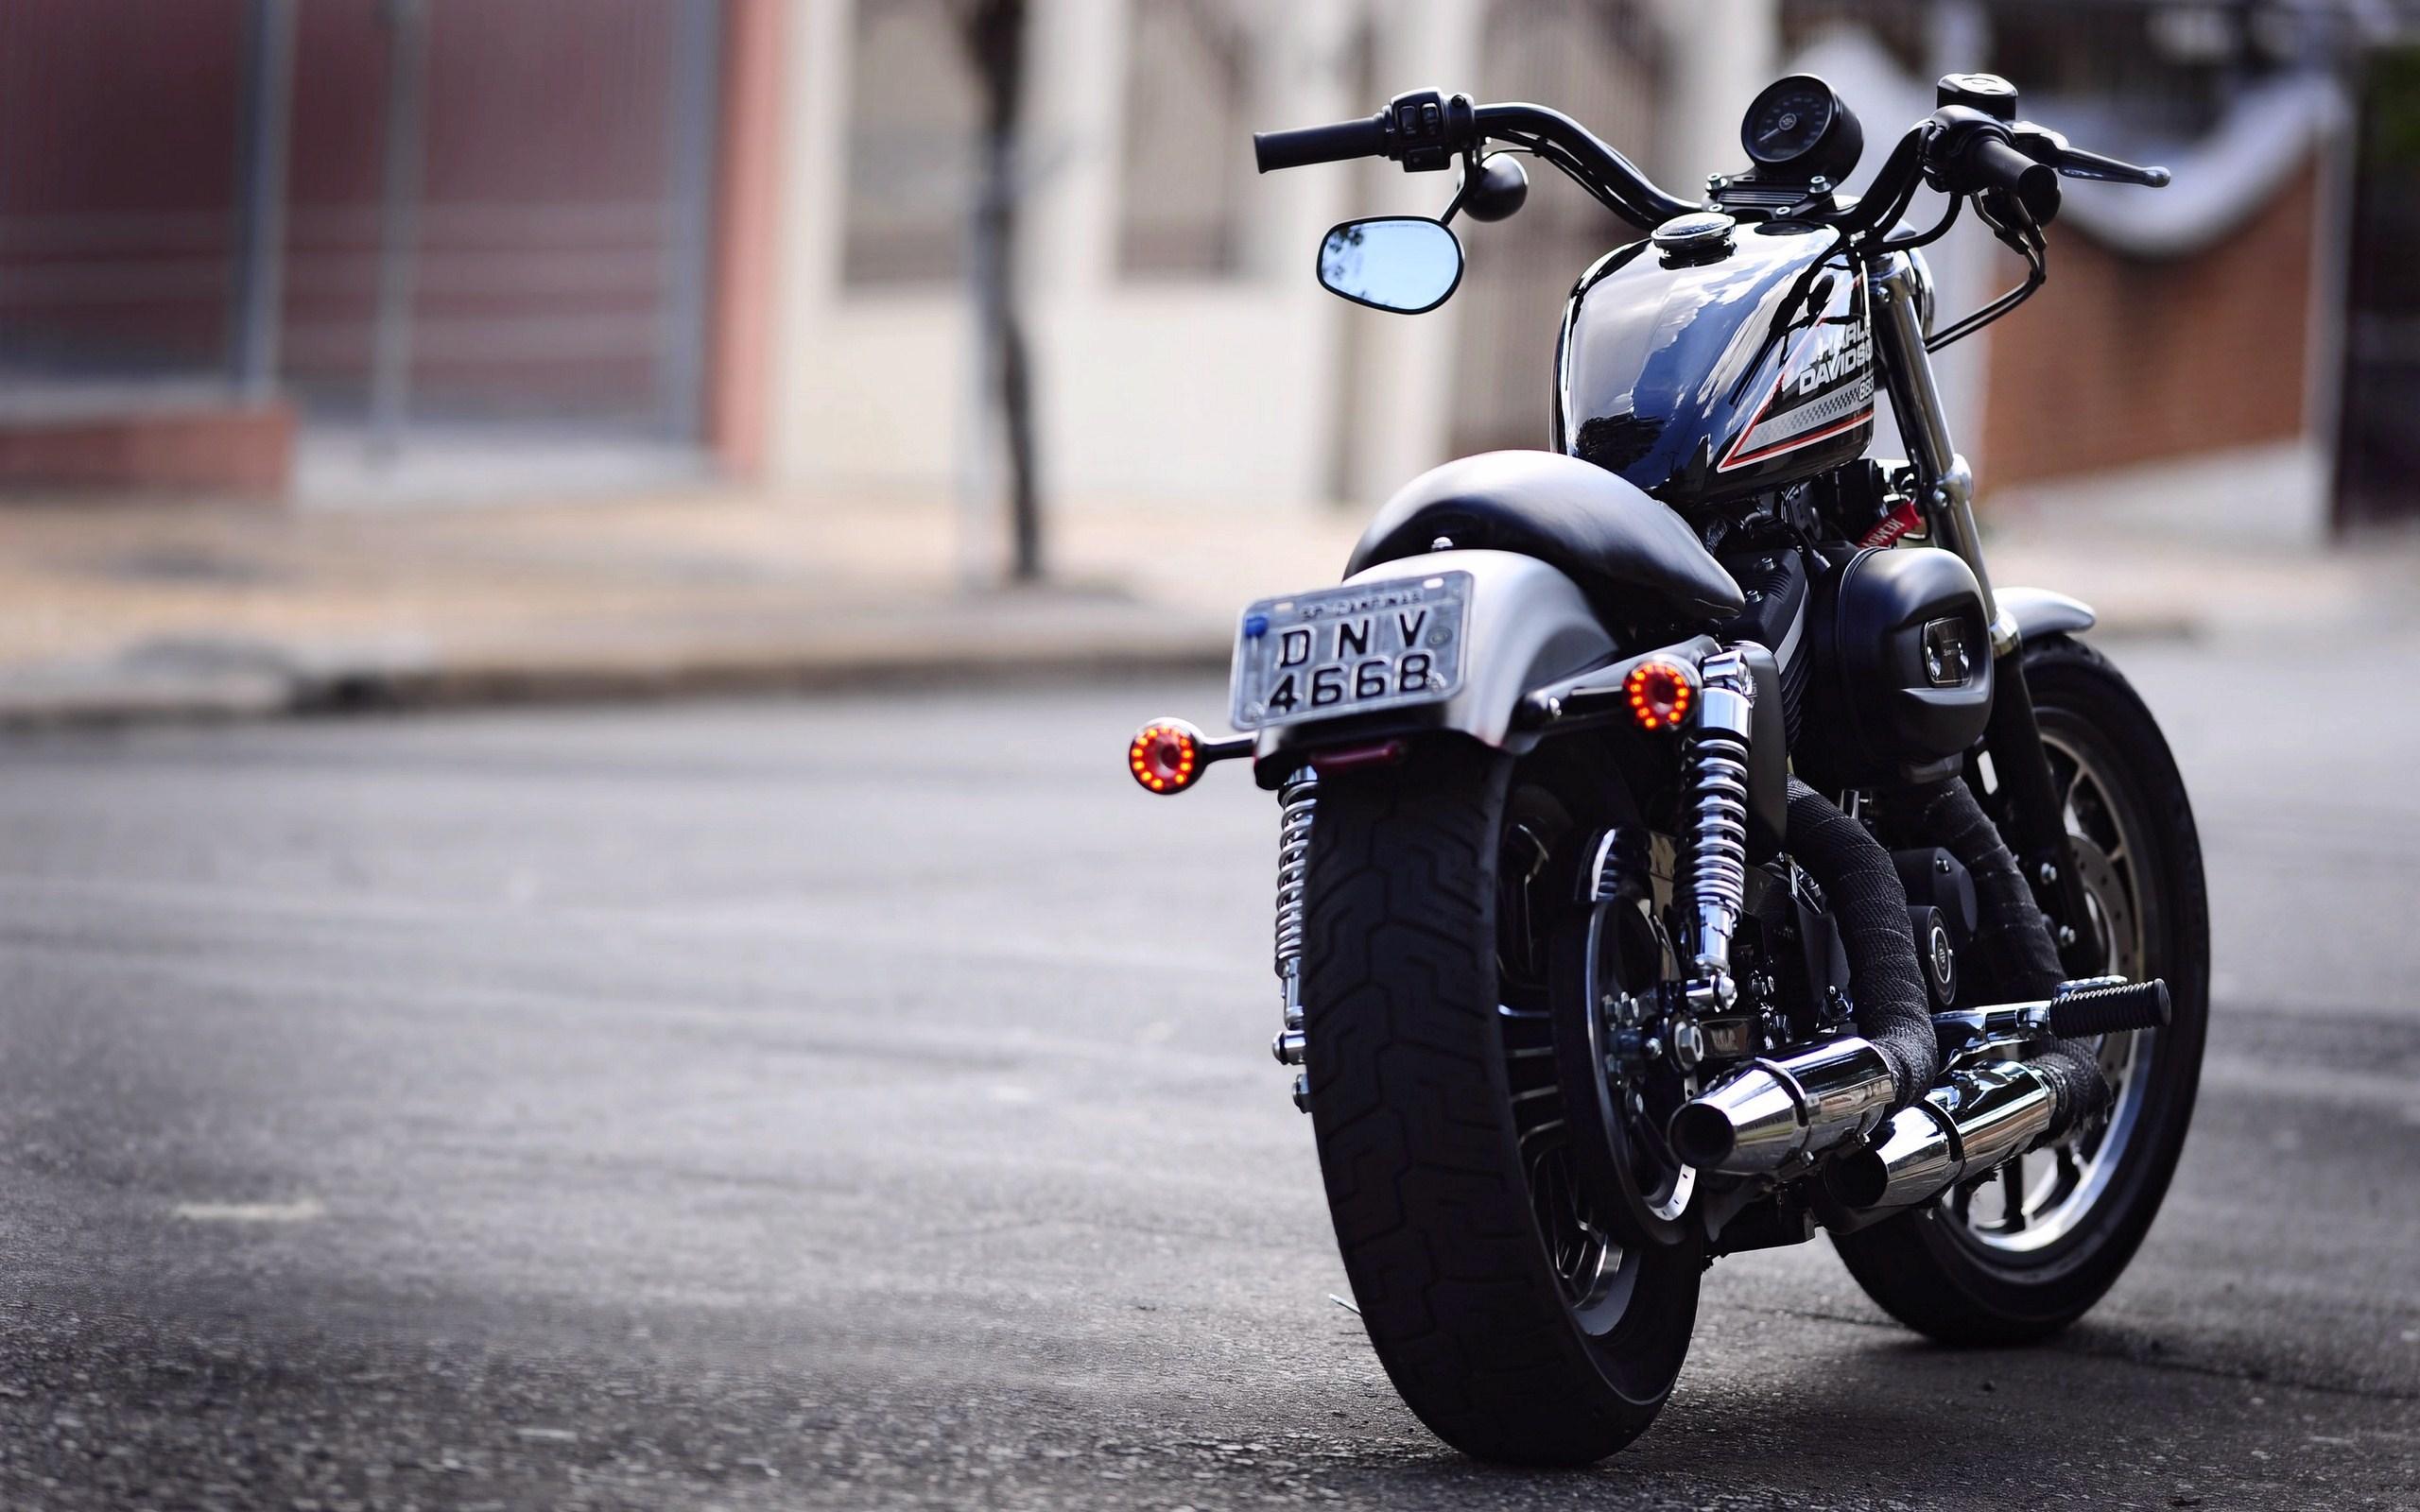 Harley Davidson Wallpapers Archives   HD Desktop 2560x1600